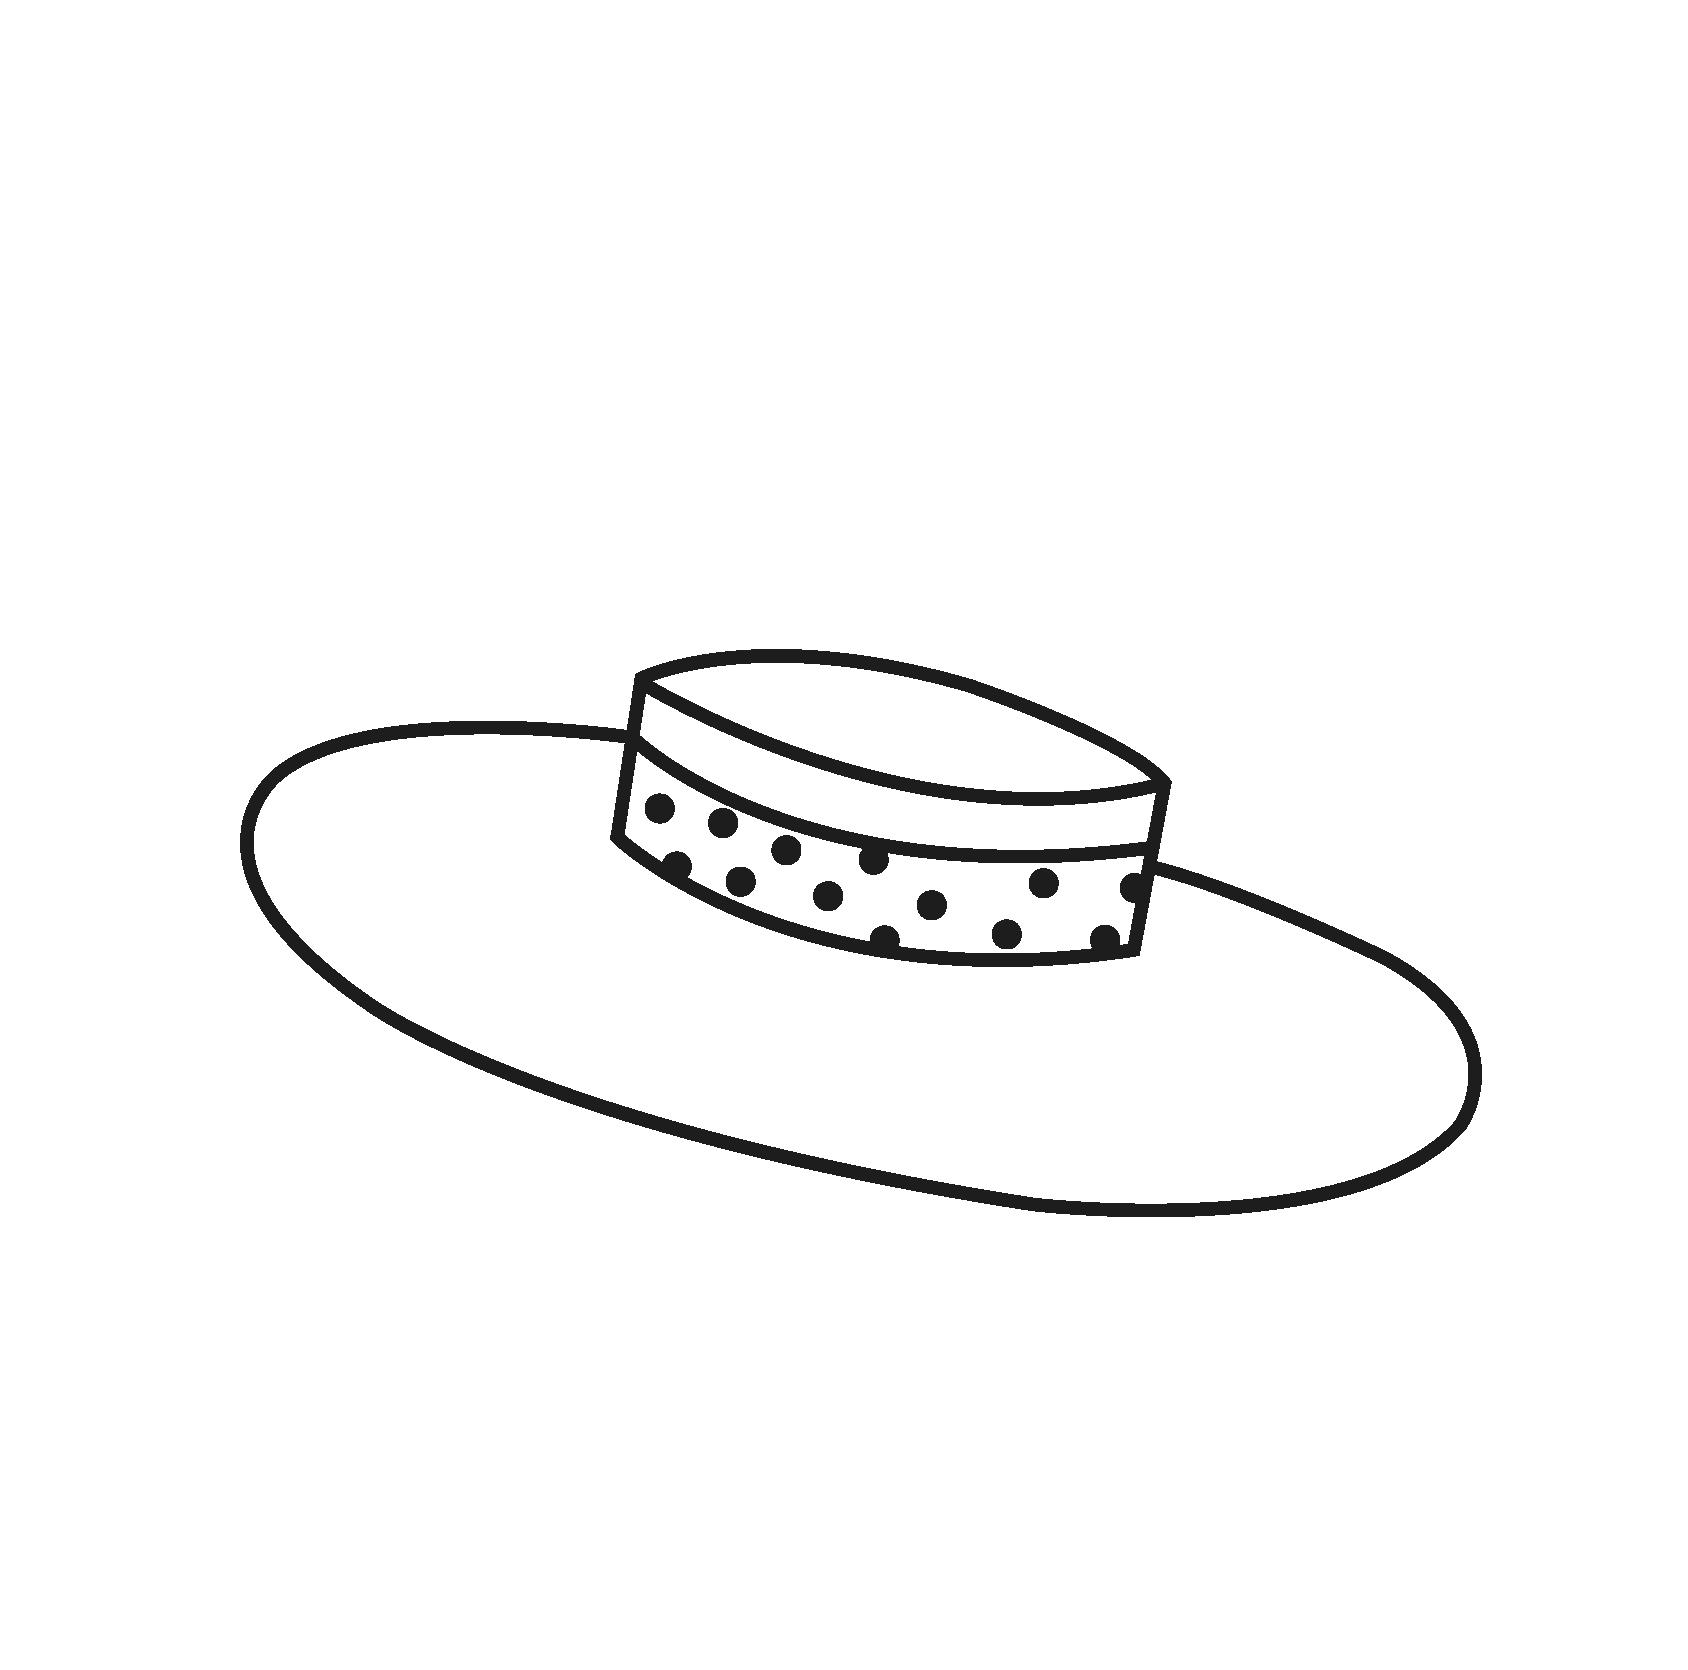 NJB Hat Black 02.png